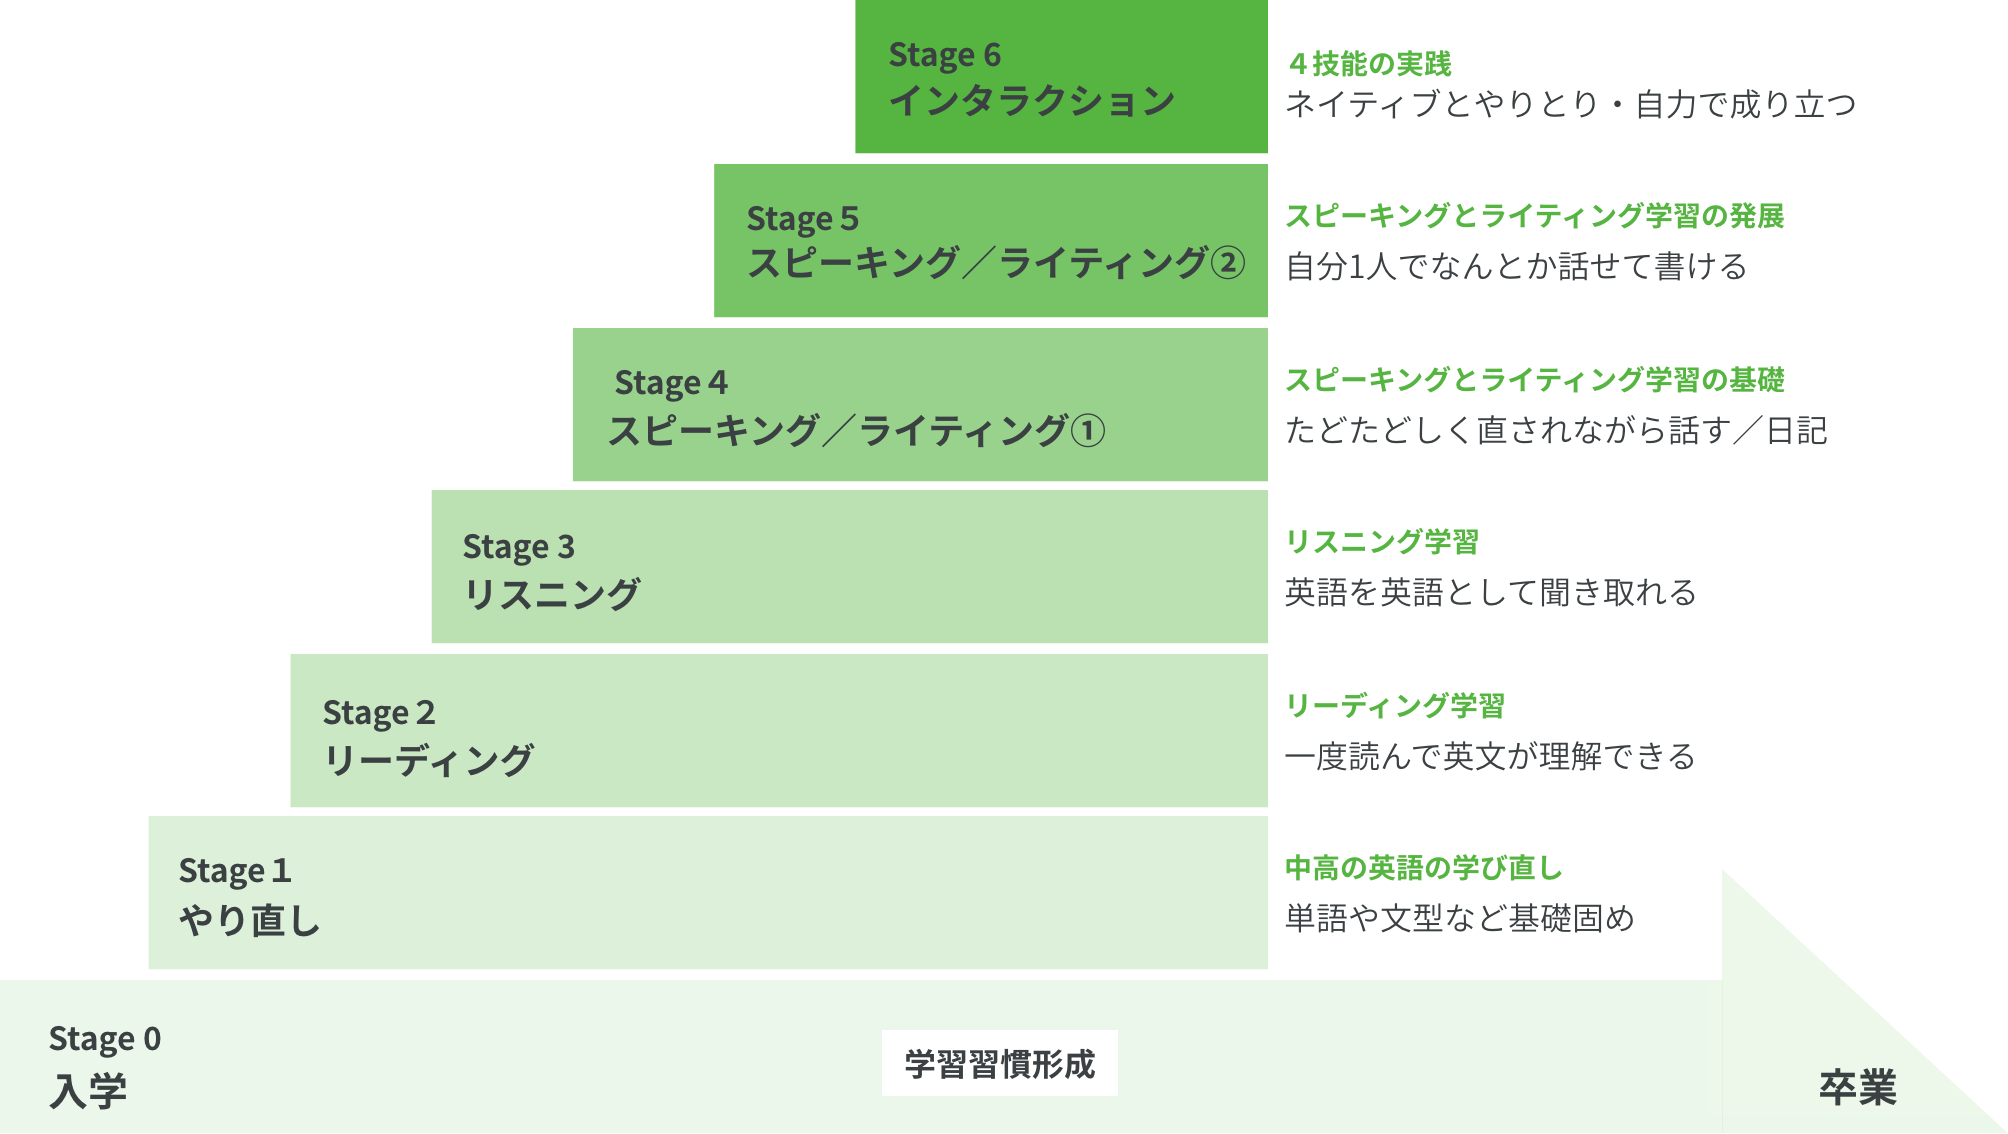 WIUで英語力が上がるステップー図